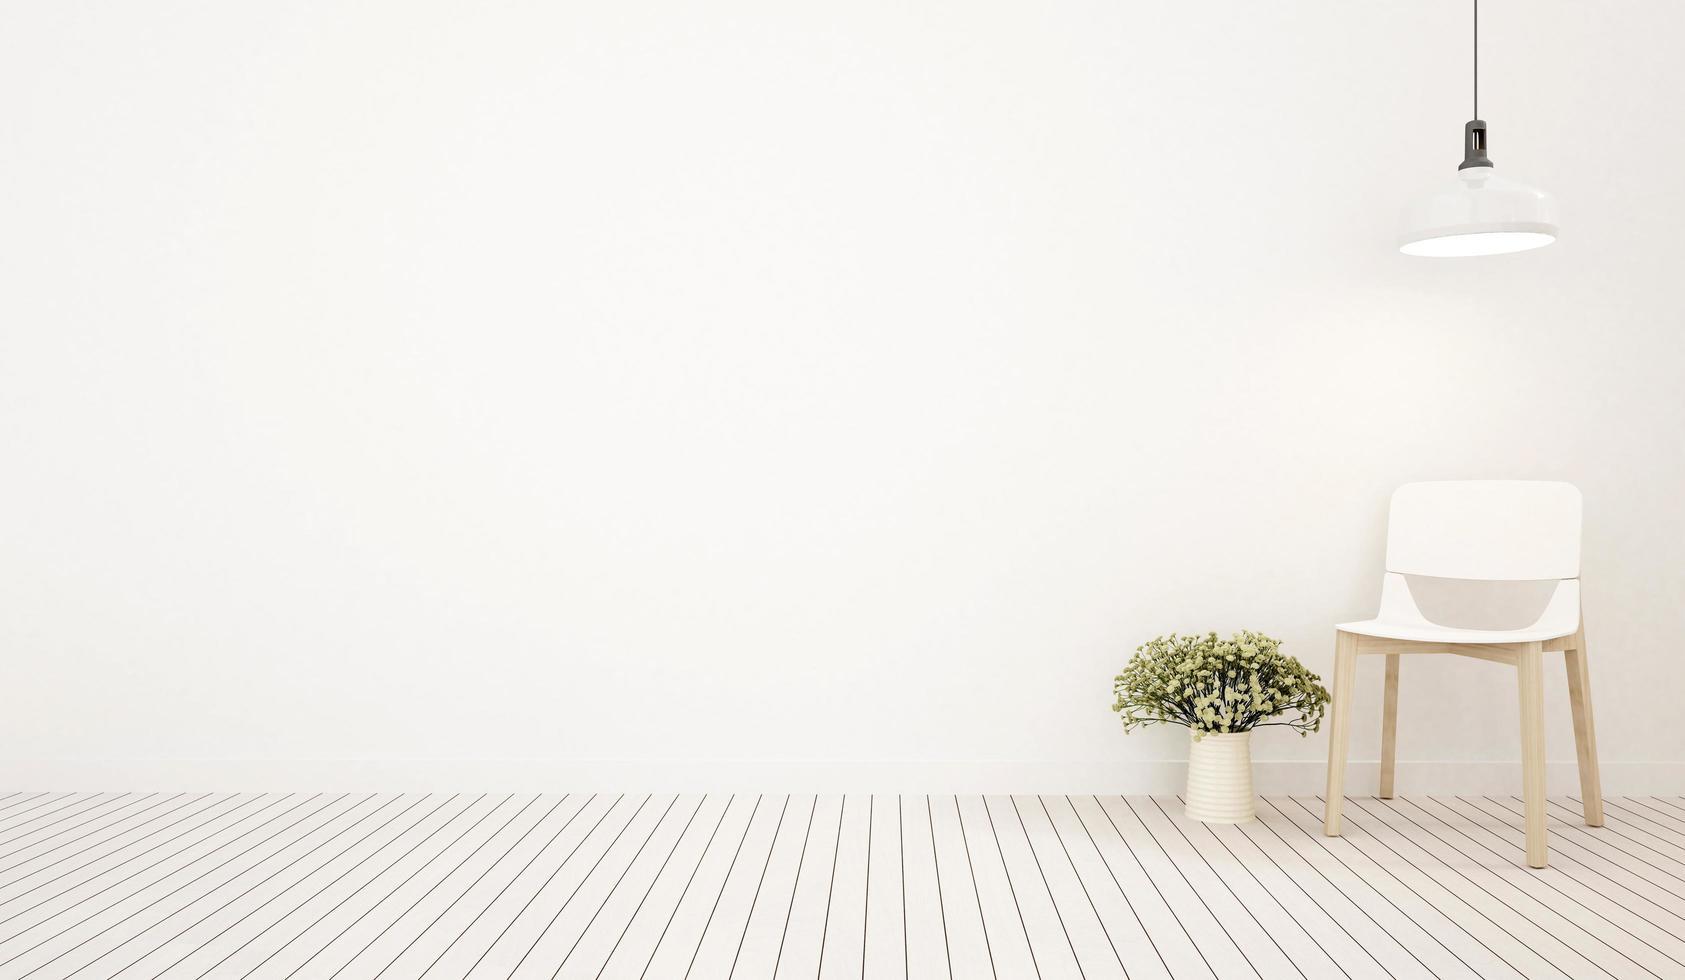 vardagsrum i hemmet eller lägenheten foto